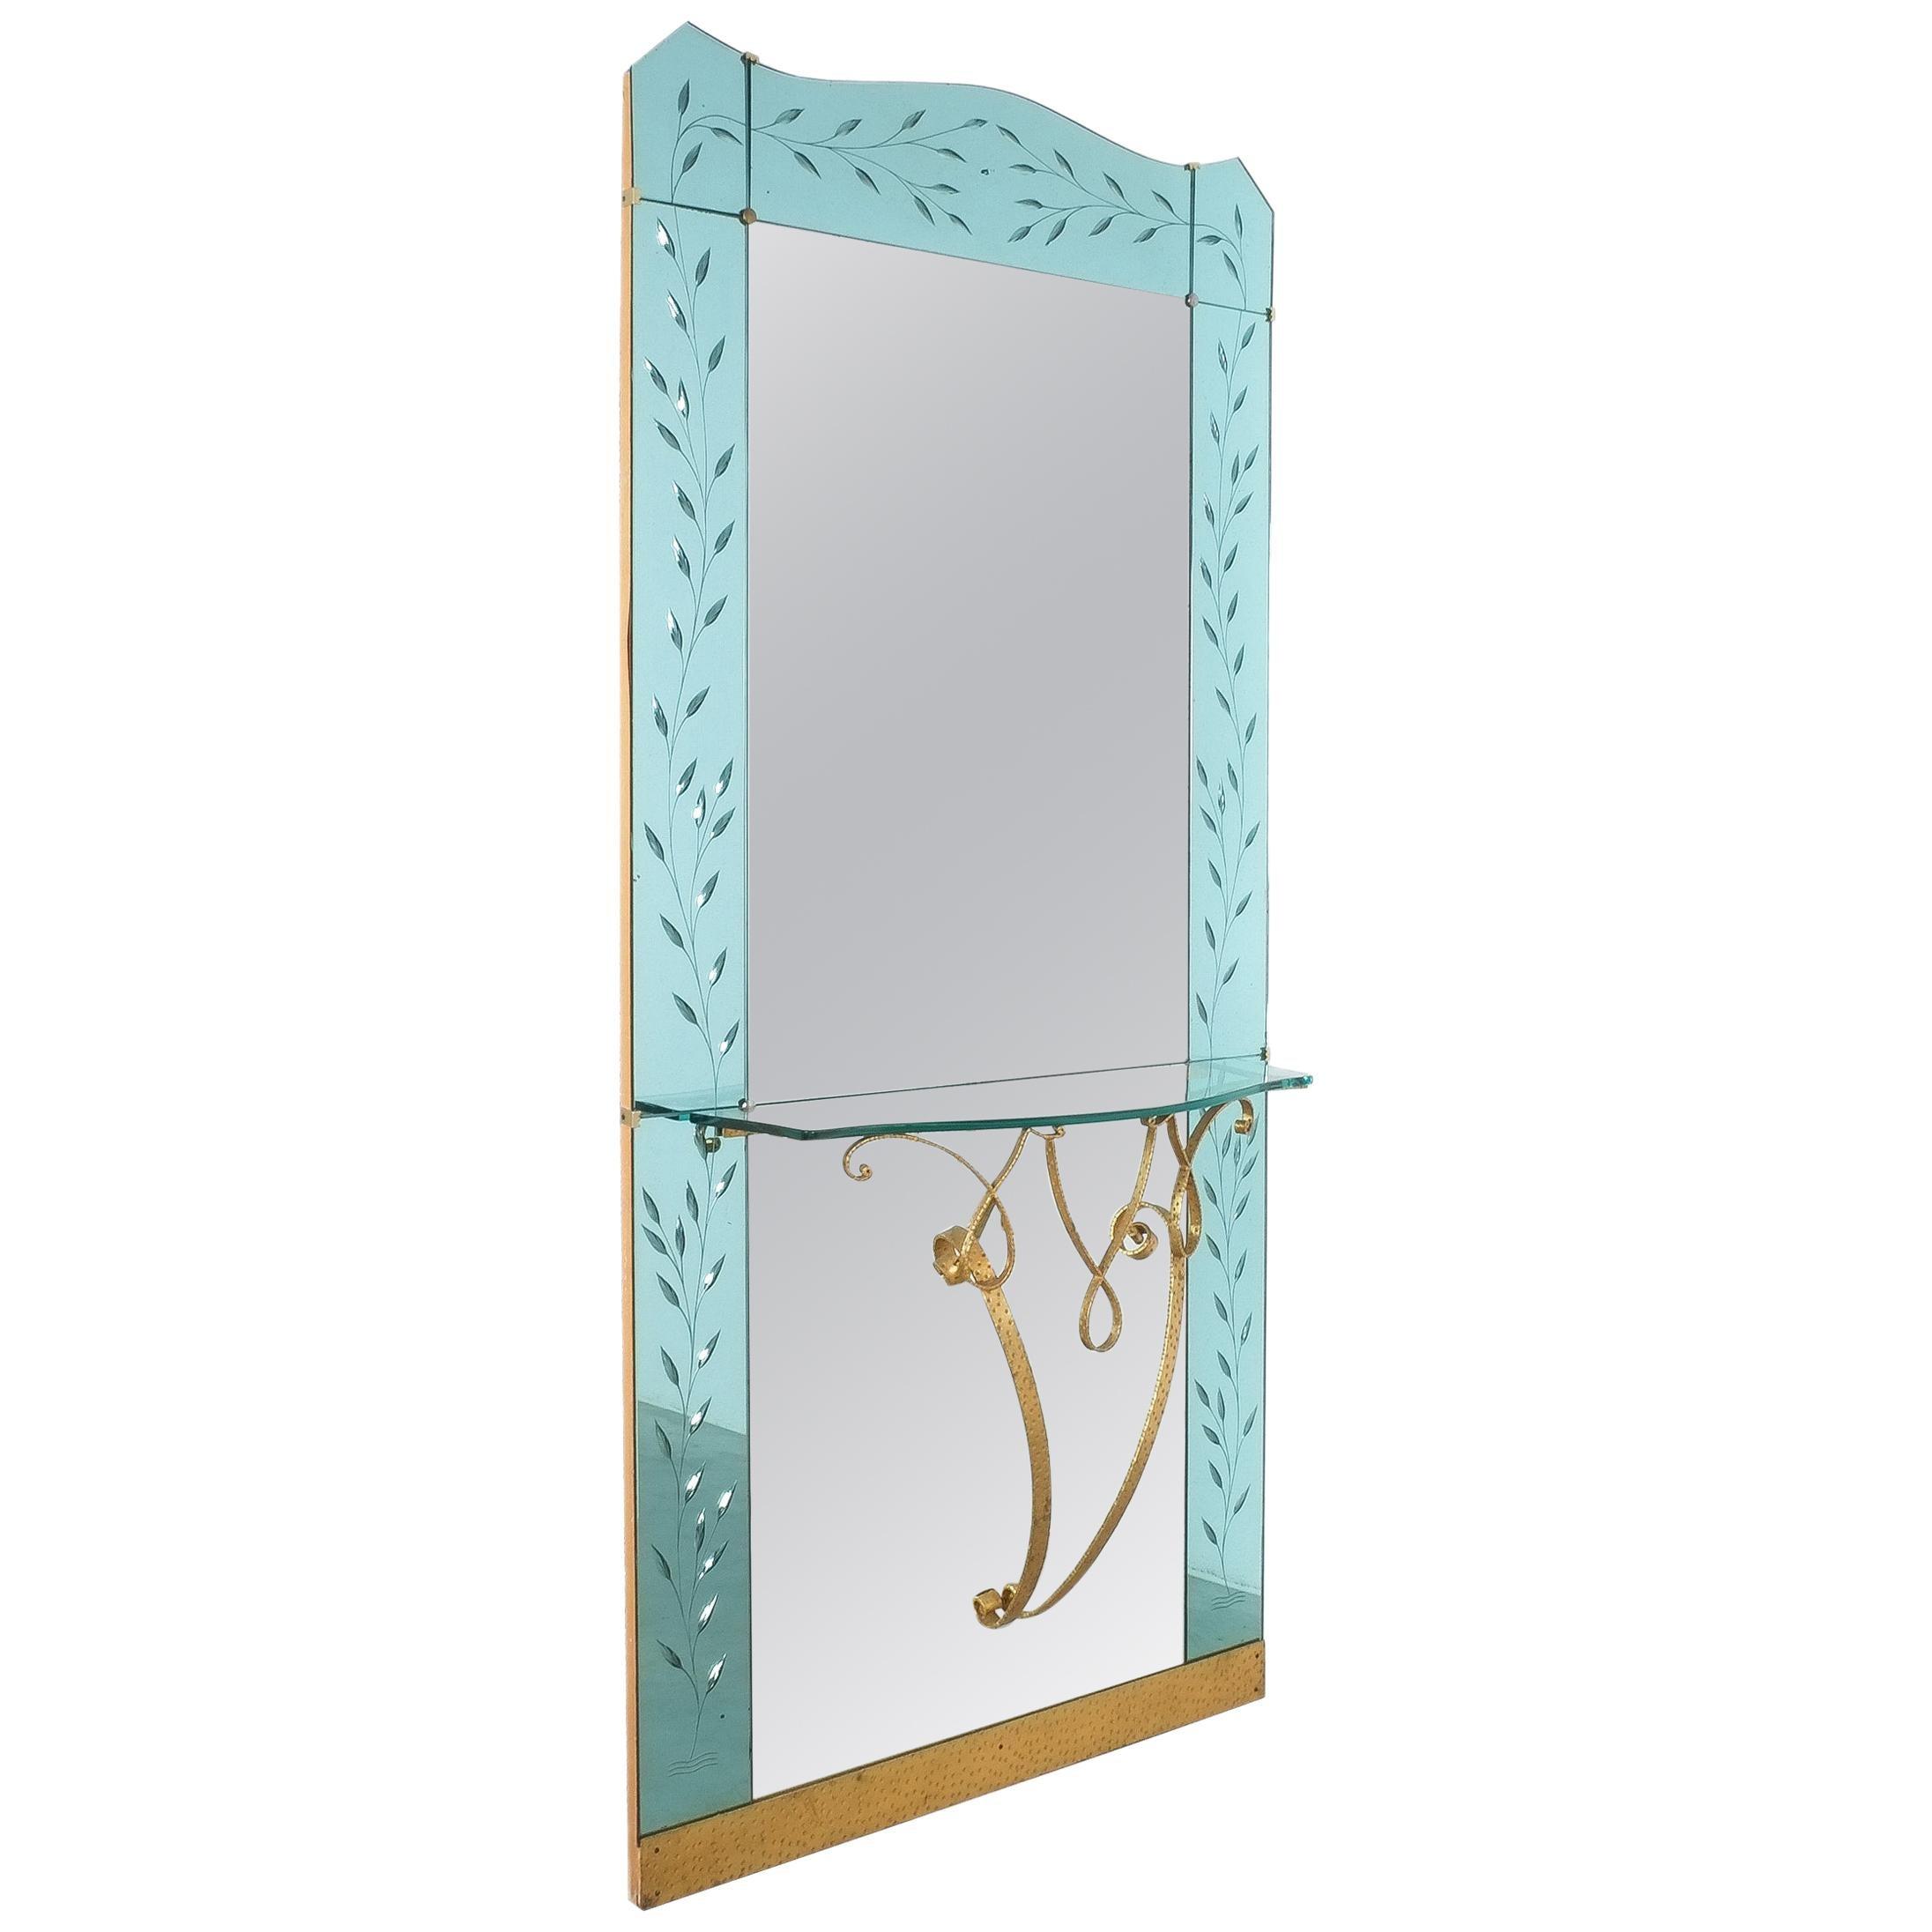 Mid Century Italian Hallway Mirror with Glass Console by Pier Luigi Colli